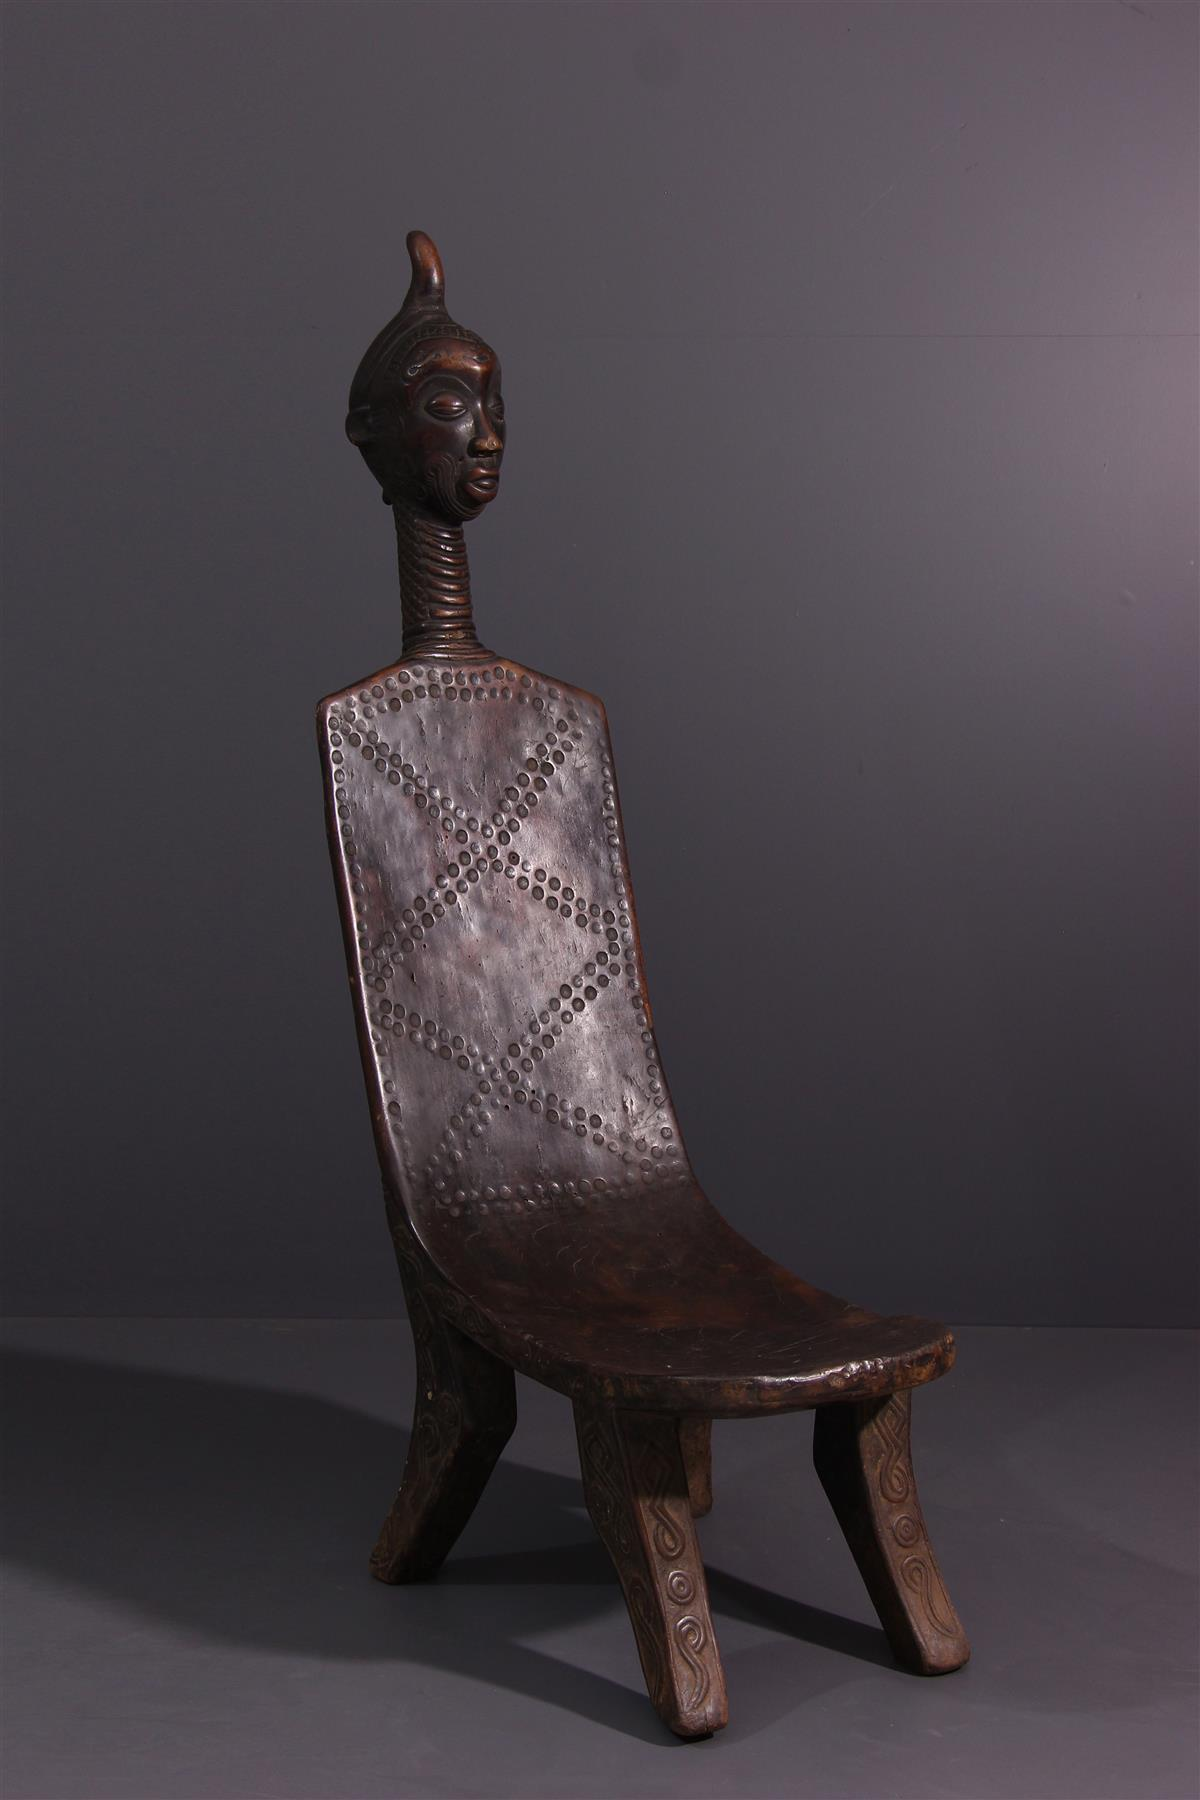 Luluwa chair - Tribal art